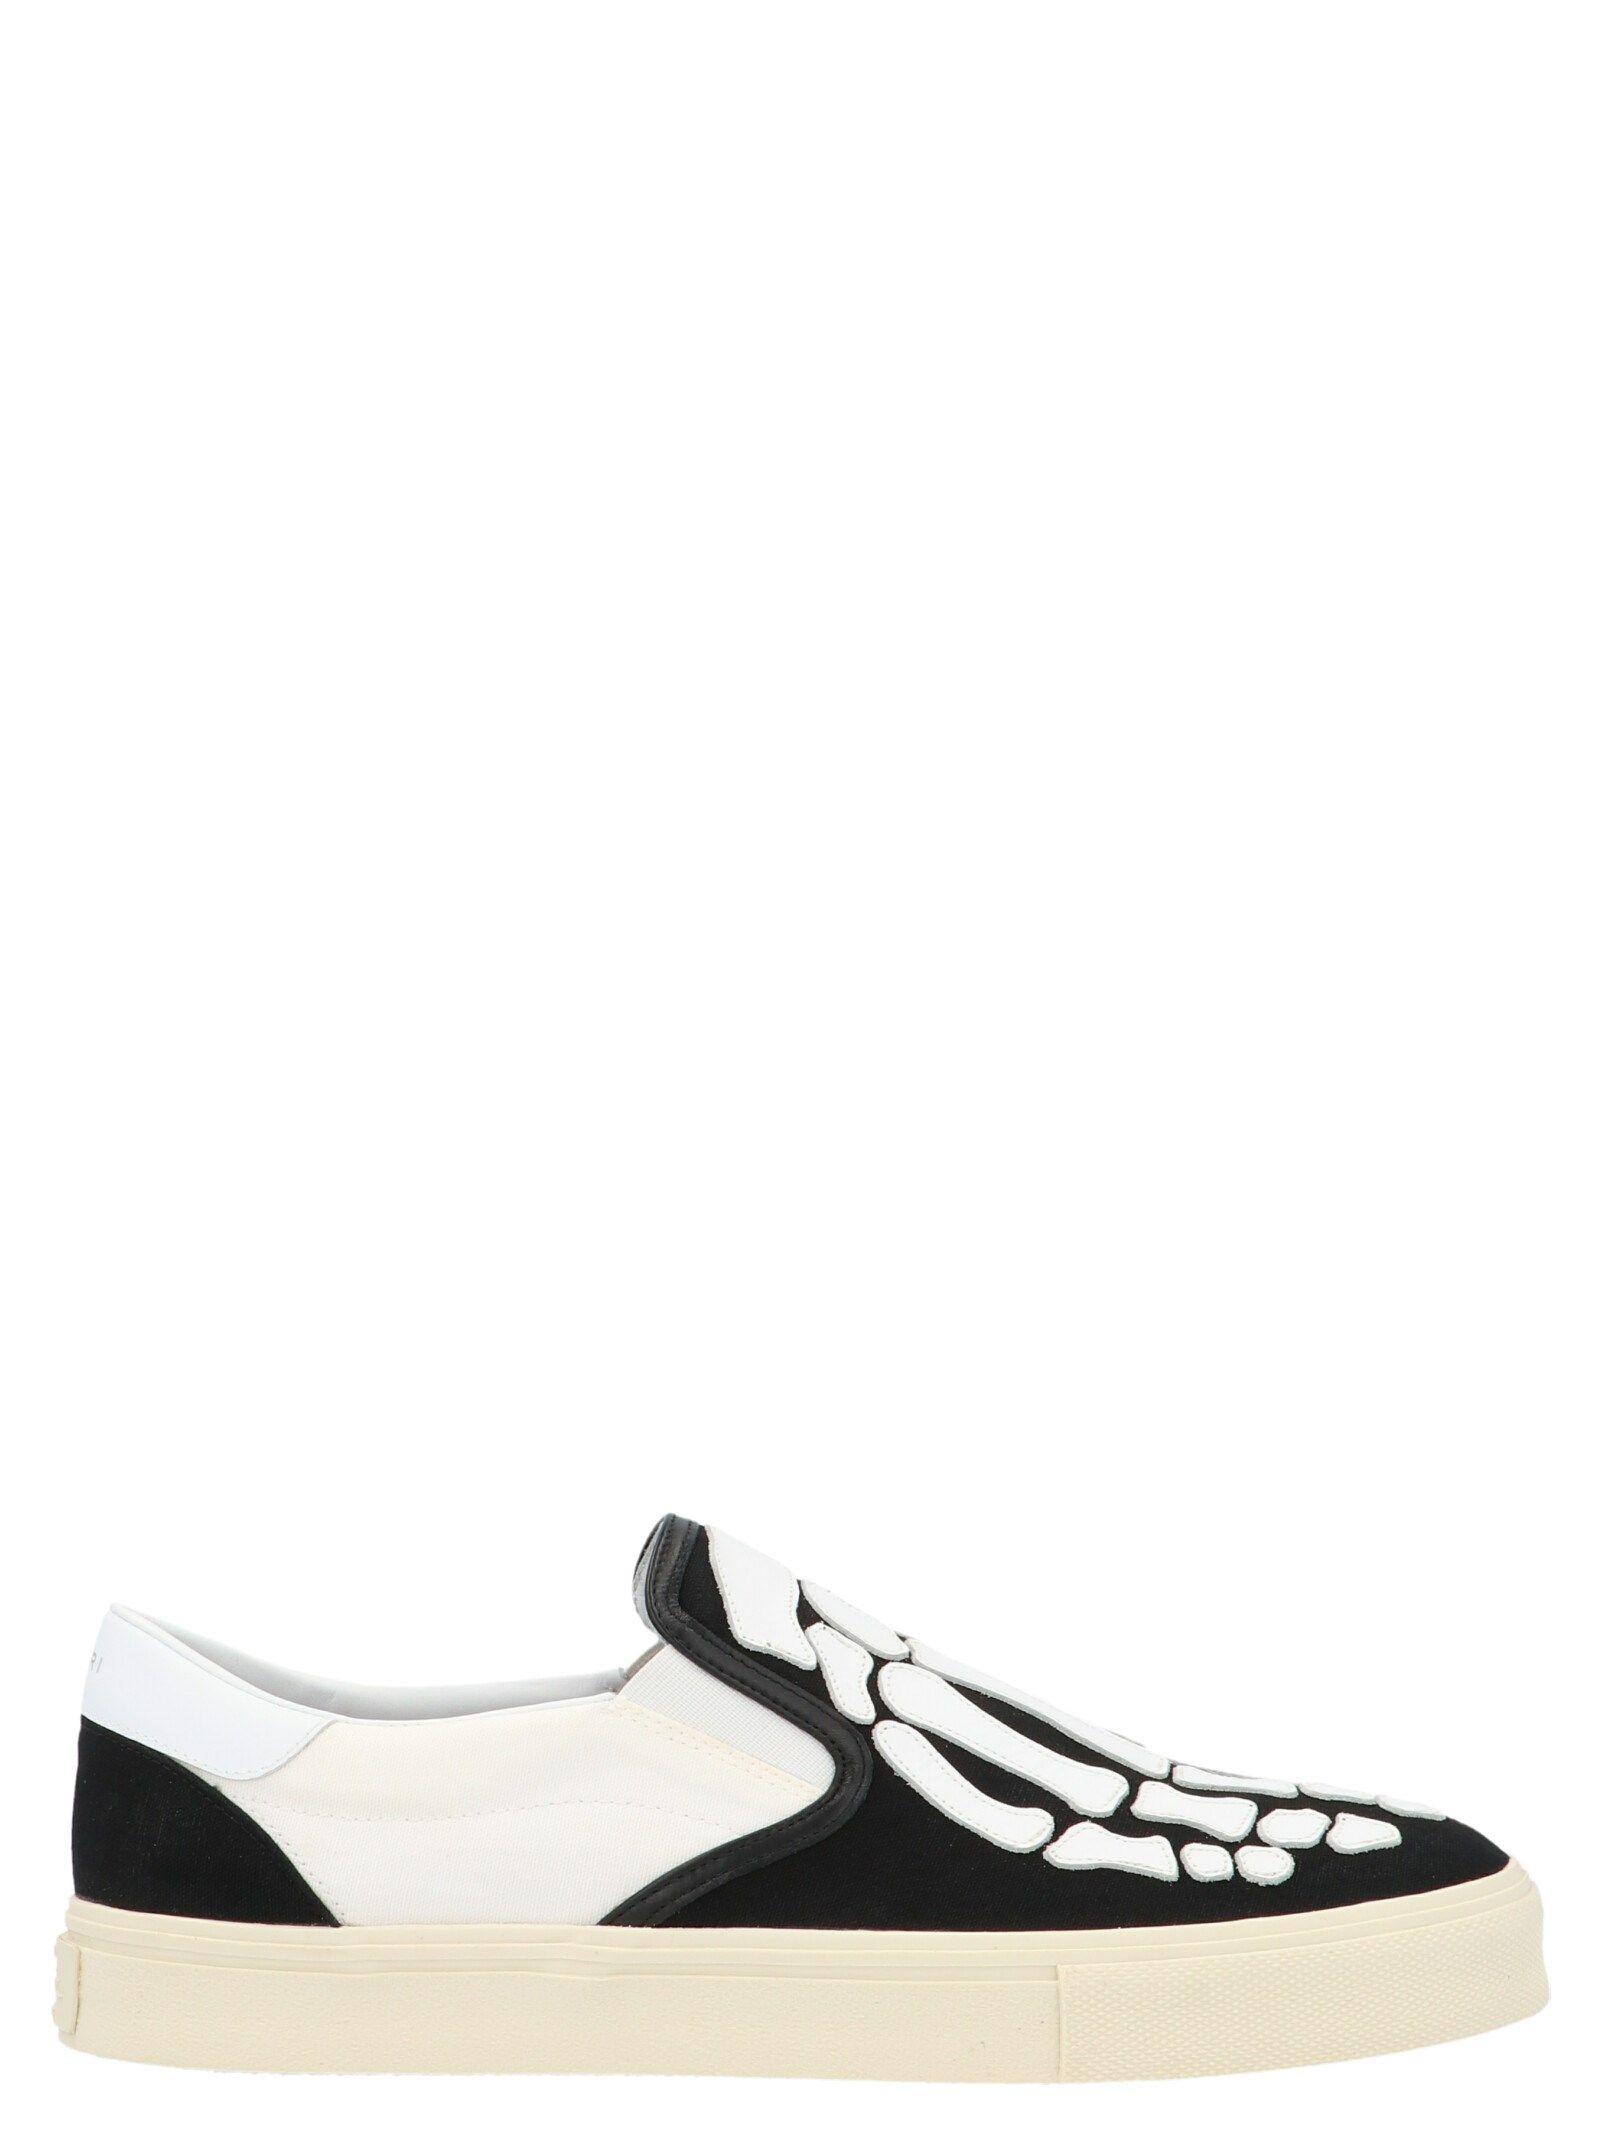 Amiri Skel Toe Leather-appliquÉd Canvas And Suede Slip-on Sneakers In Black